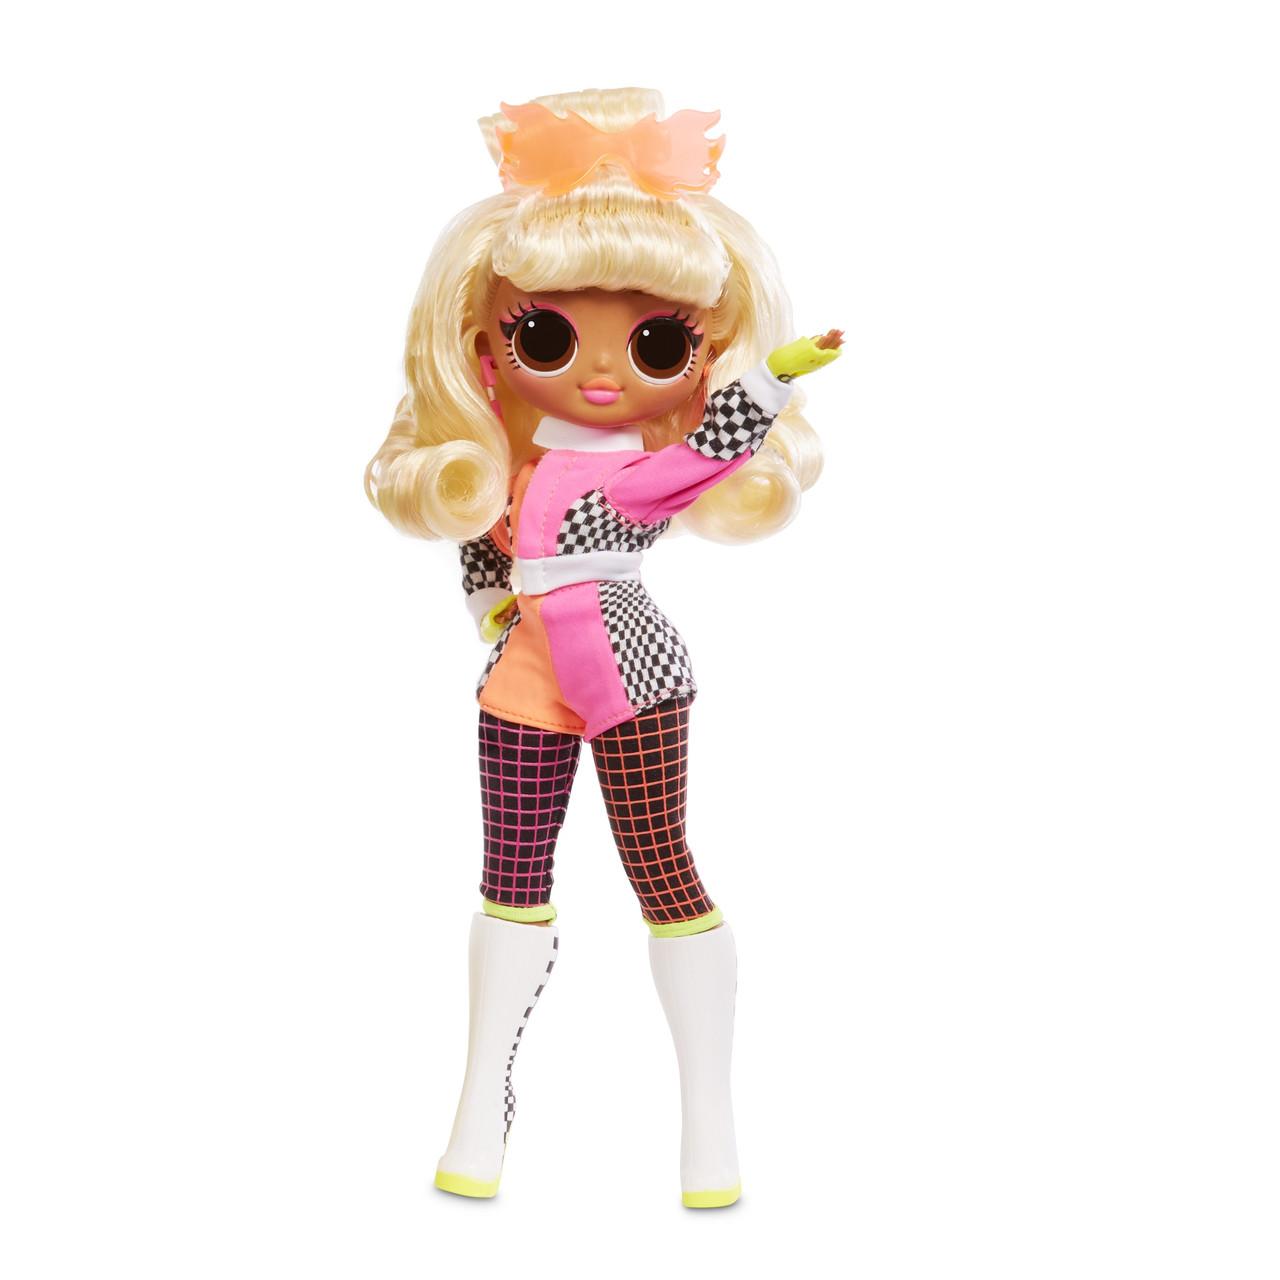 Кукла L.O.L. Surprise OMG Lights Speedster - фото 2